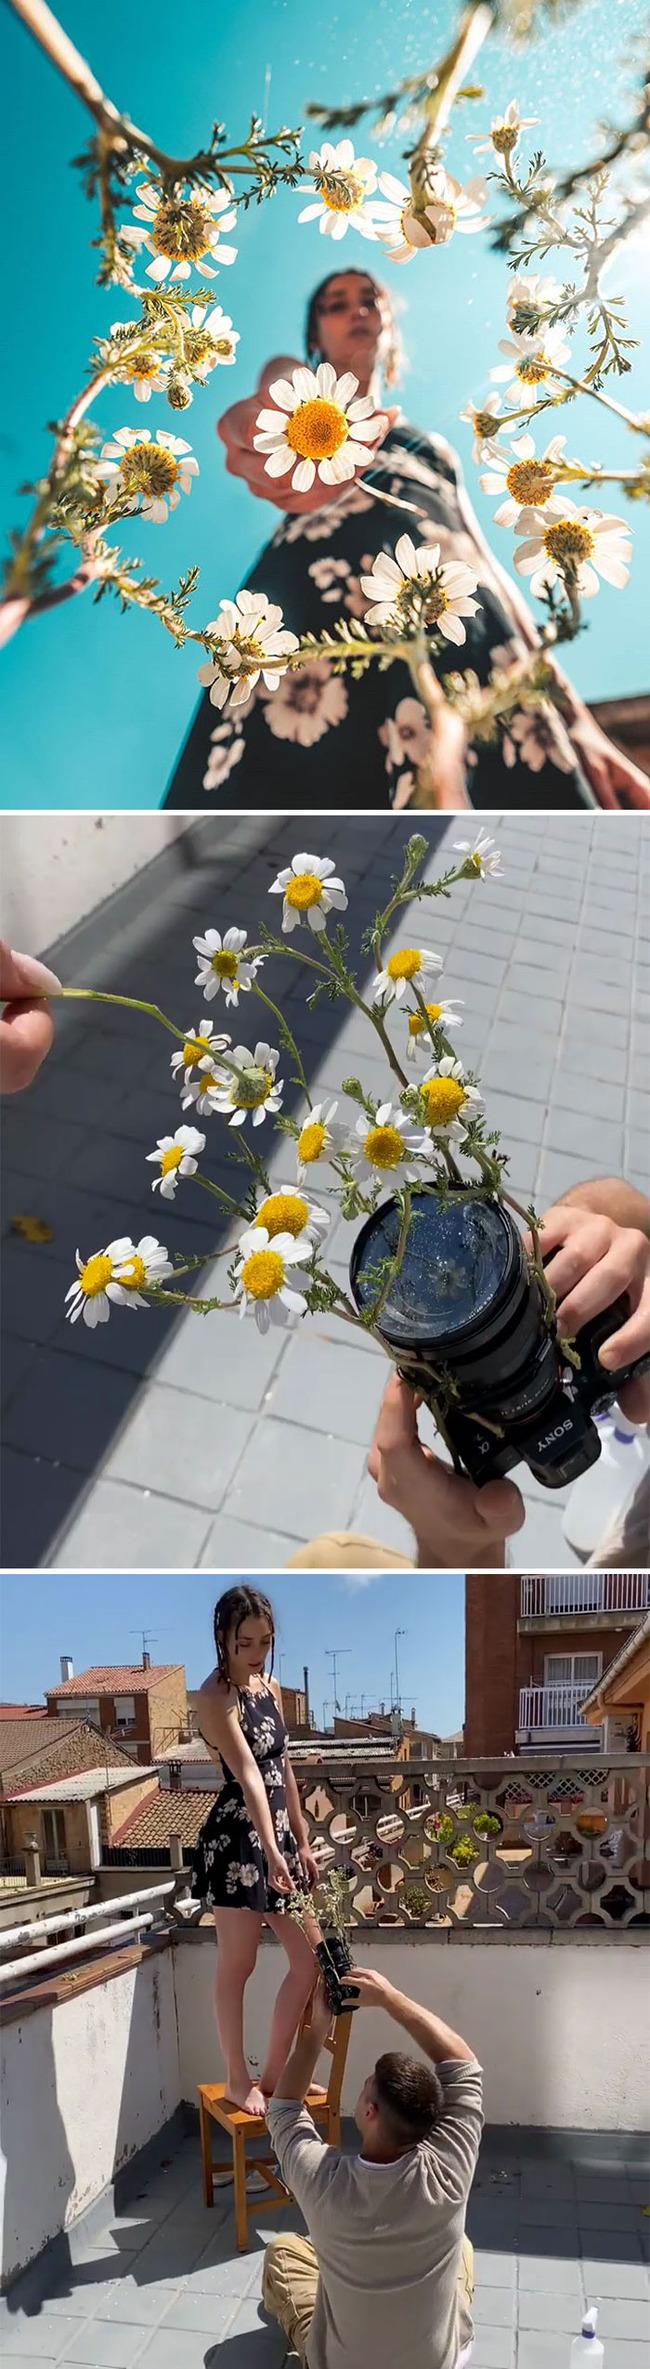 photography-tricks-jordi-koalitic-5f6b029b1ac31__700